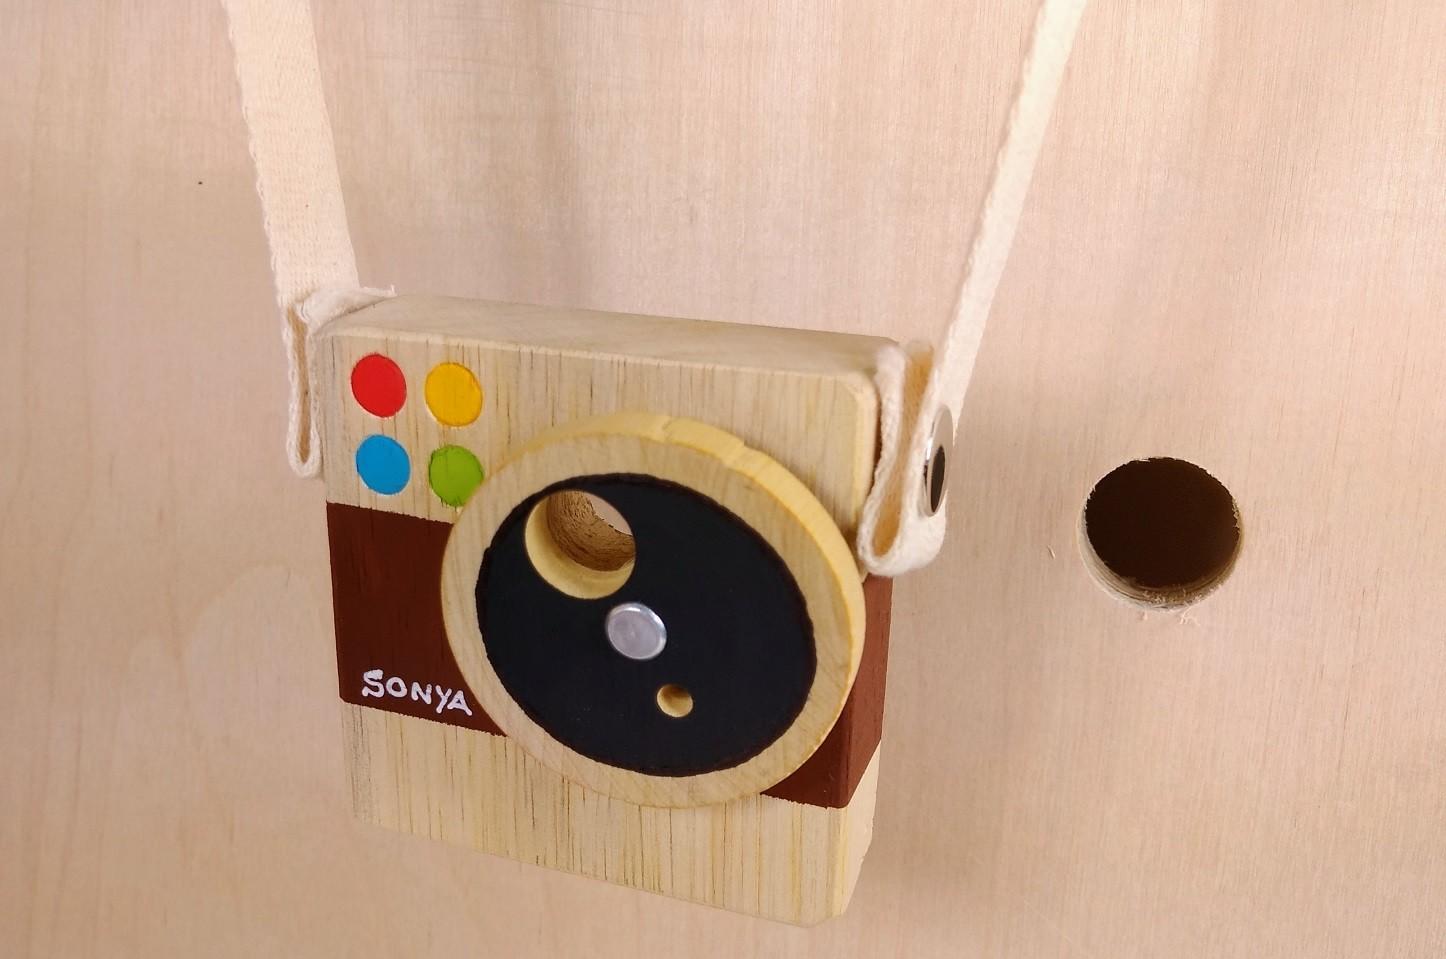 Brinquedo de madeira - Minicâmera CuteCam Sonya, da Cute Cubes - Cód. CC005